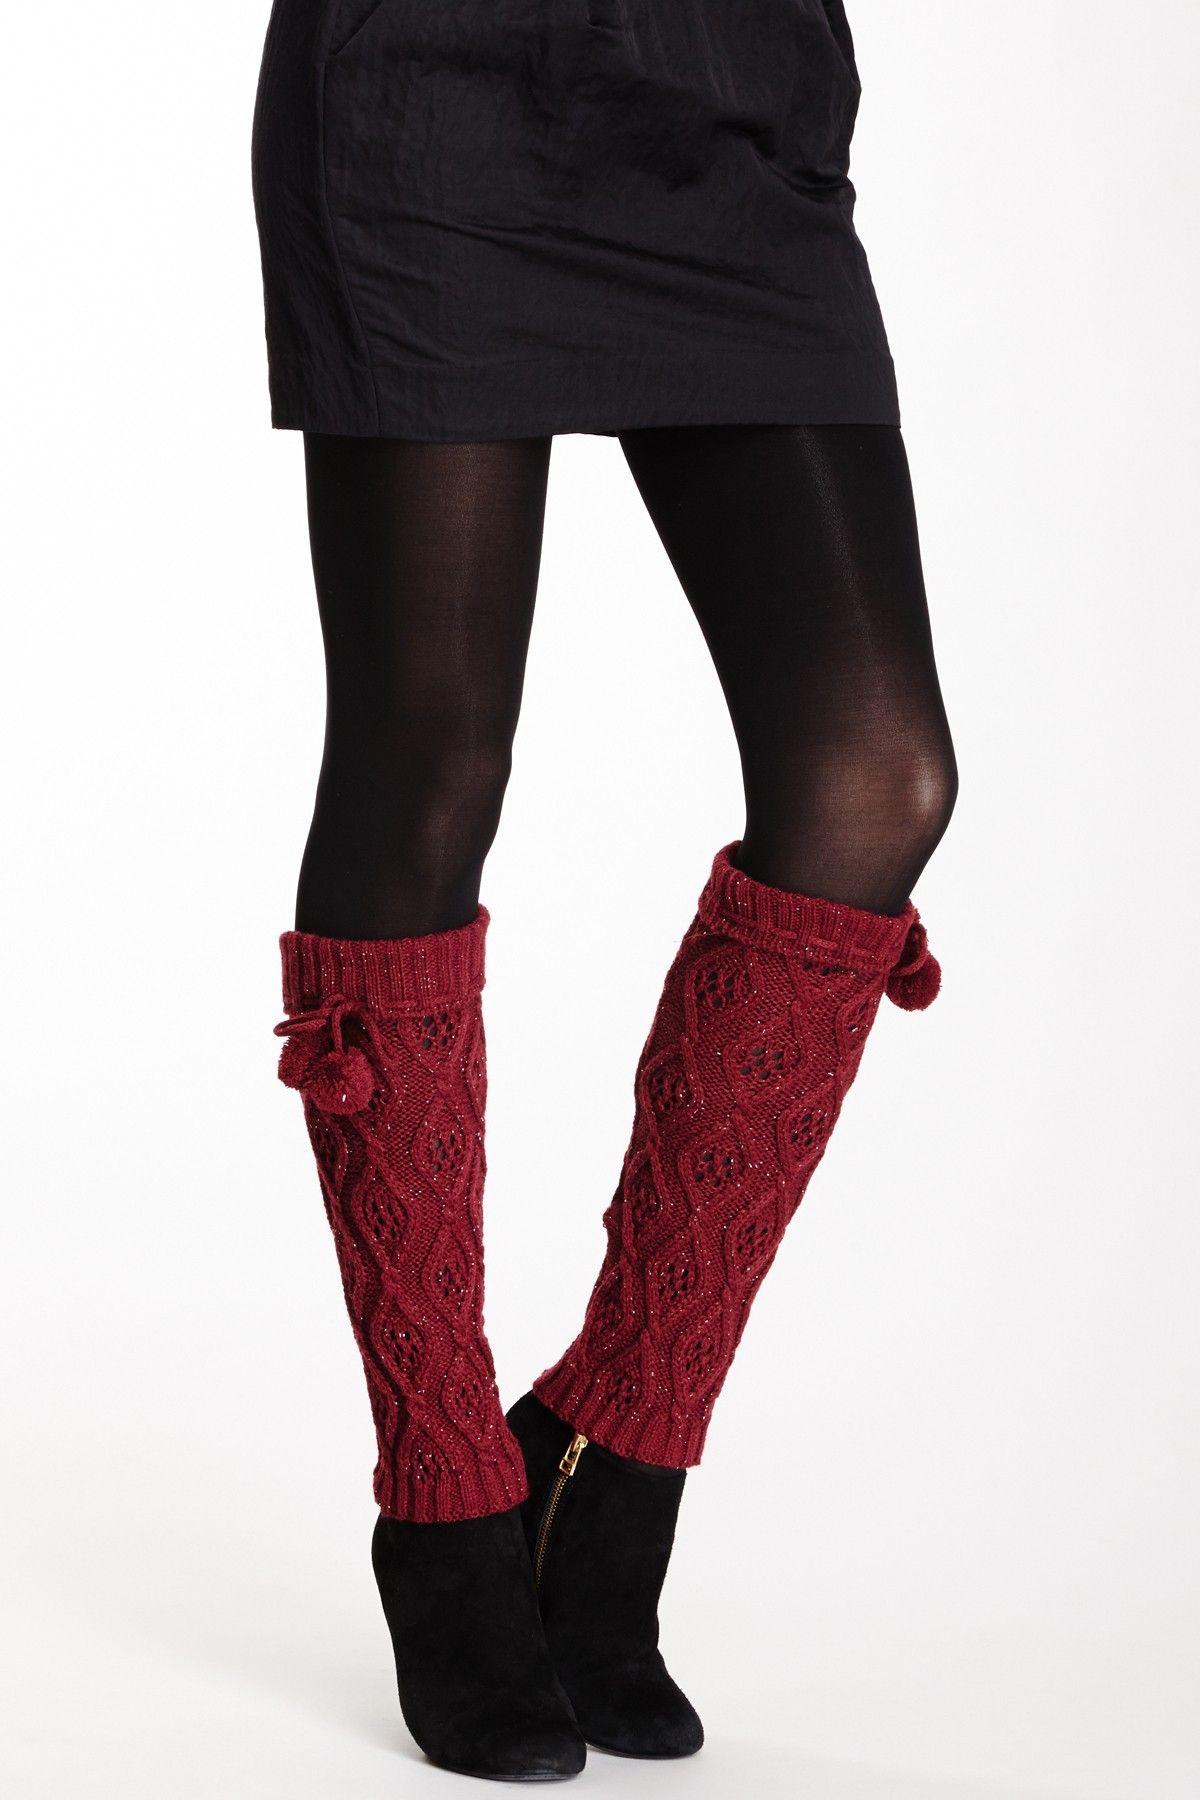 Cozy Cable Lurex Leg Warmer Fashion, My style, Closet